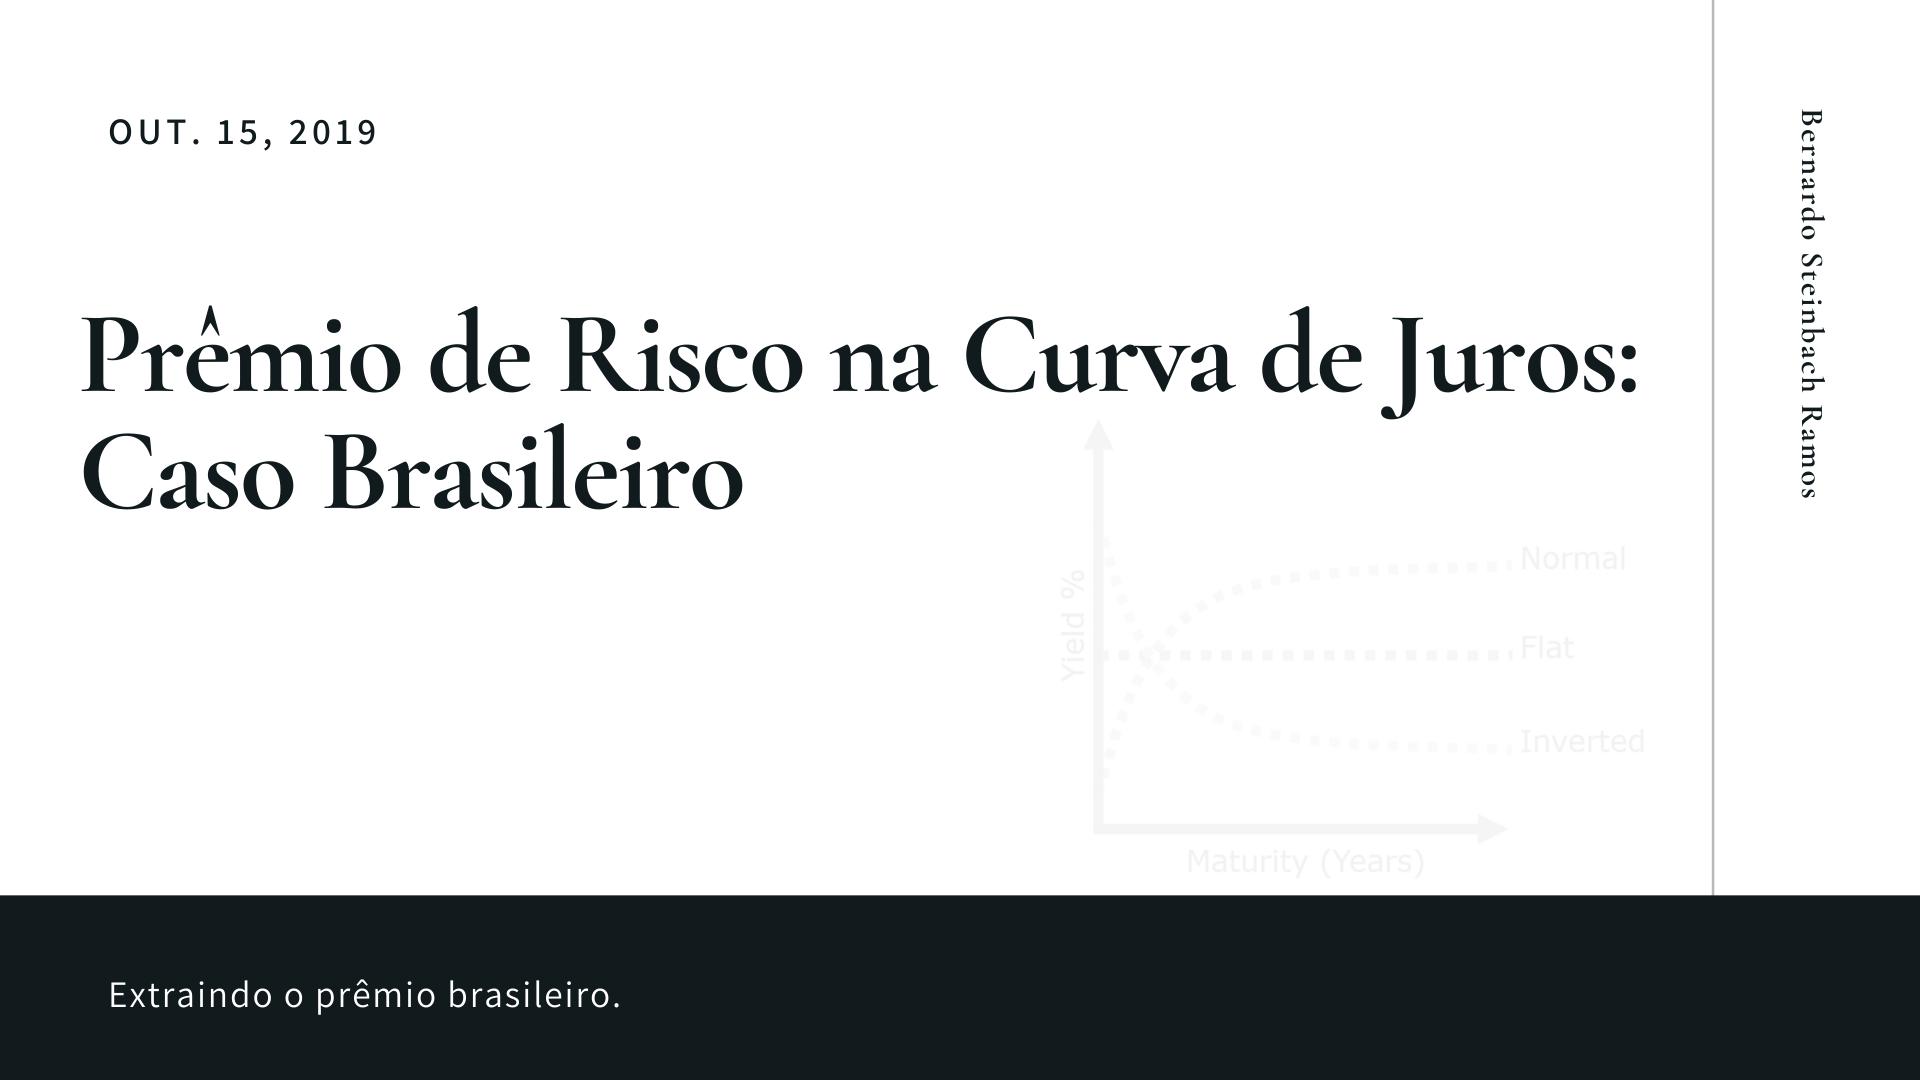 Prêmio de Risco na Curva de Juros: Caso Brasileiro